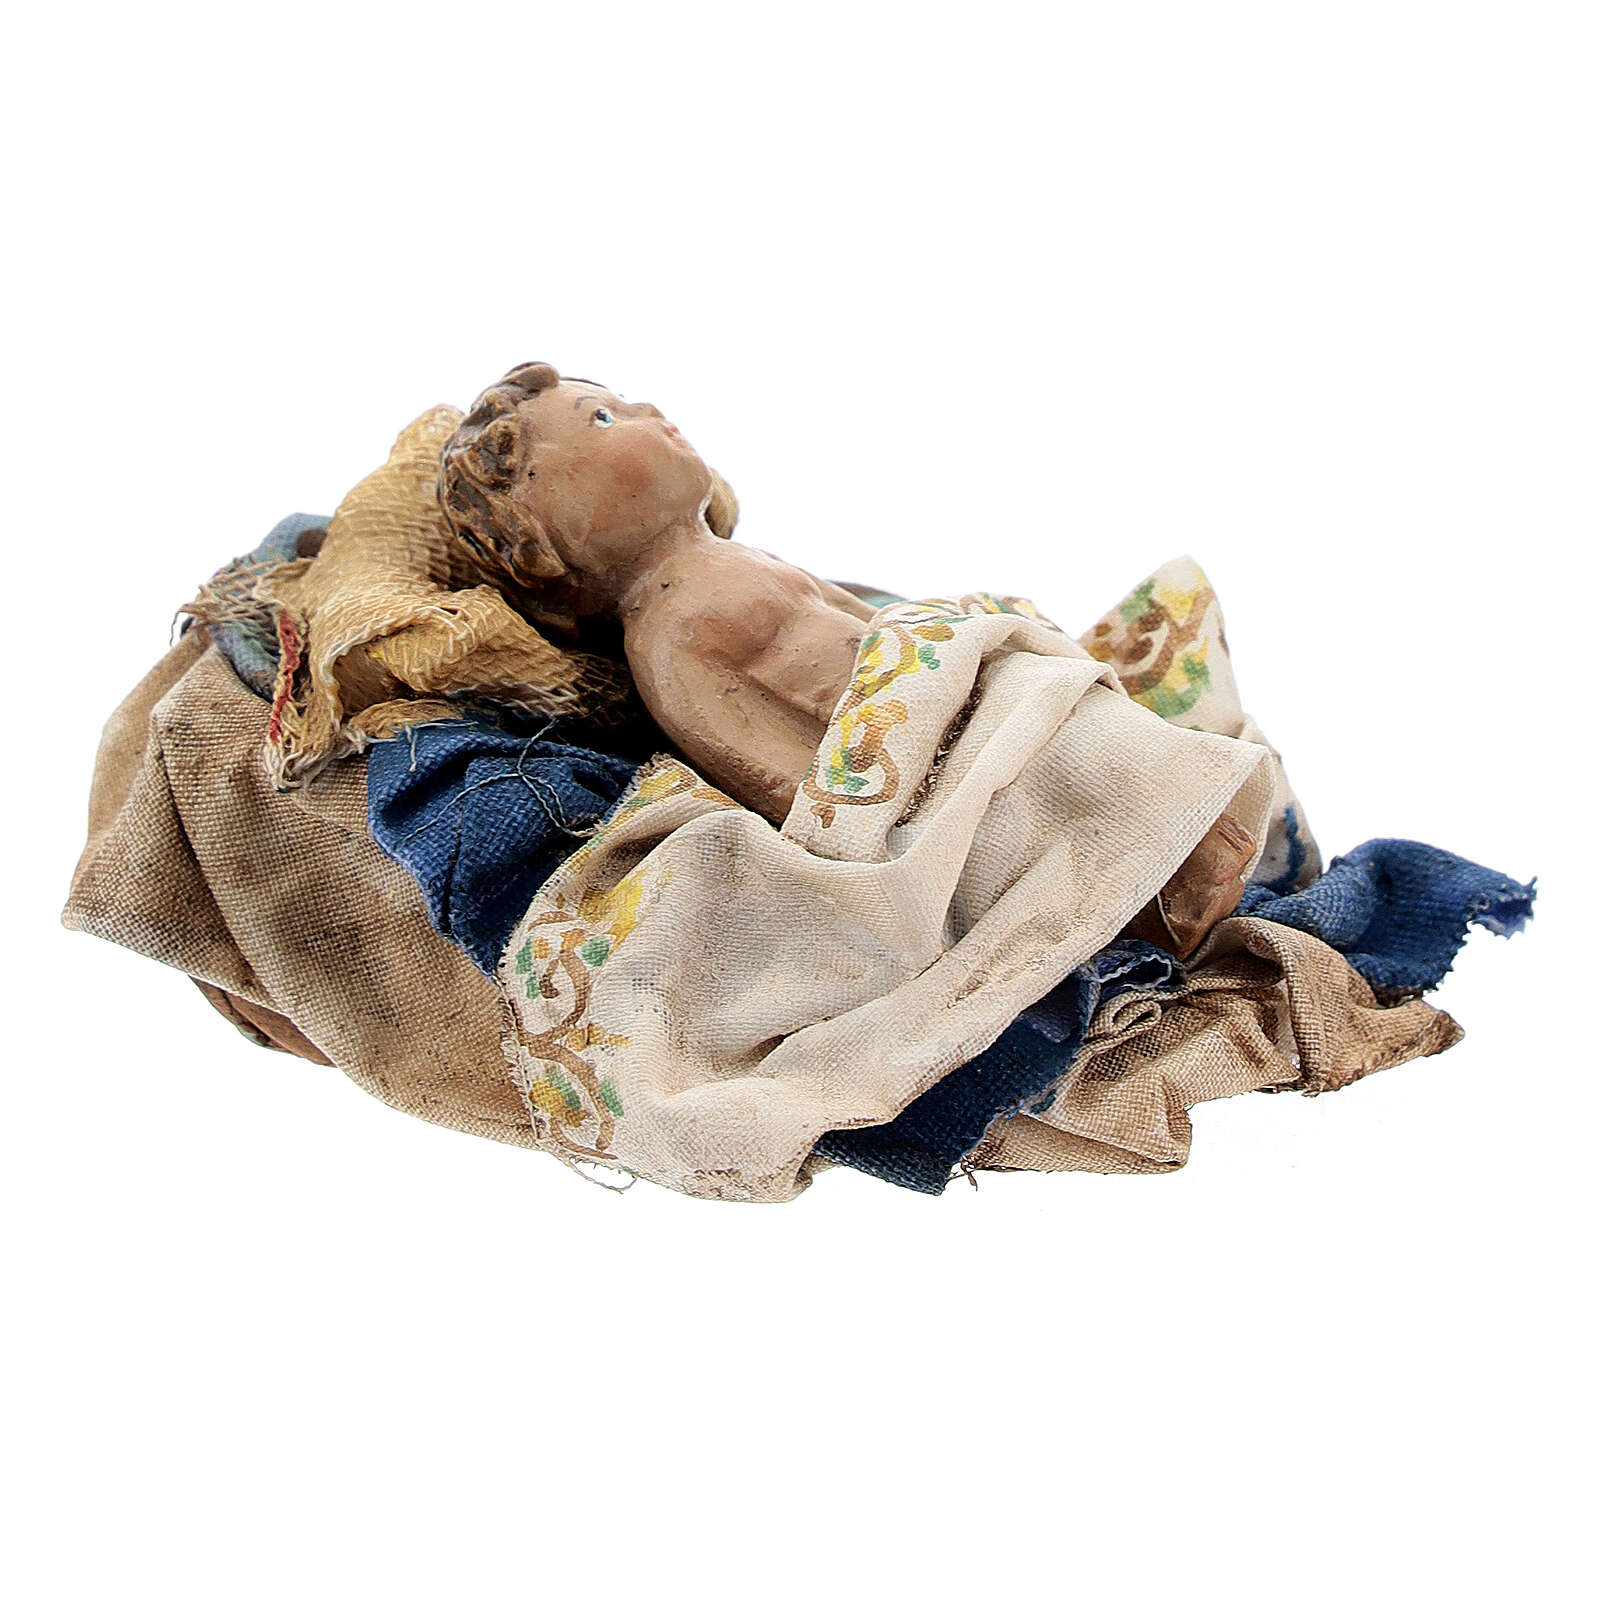 Natividad 13 cm Belén Angela Tripi 4